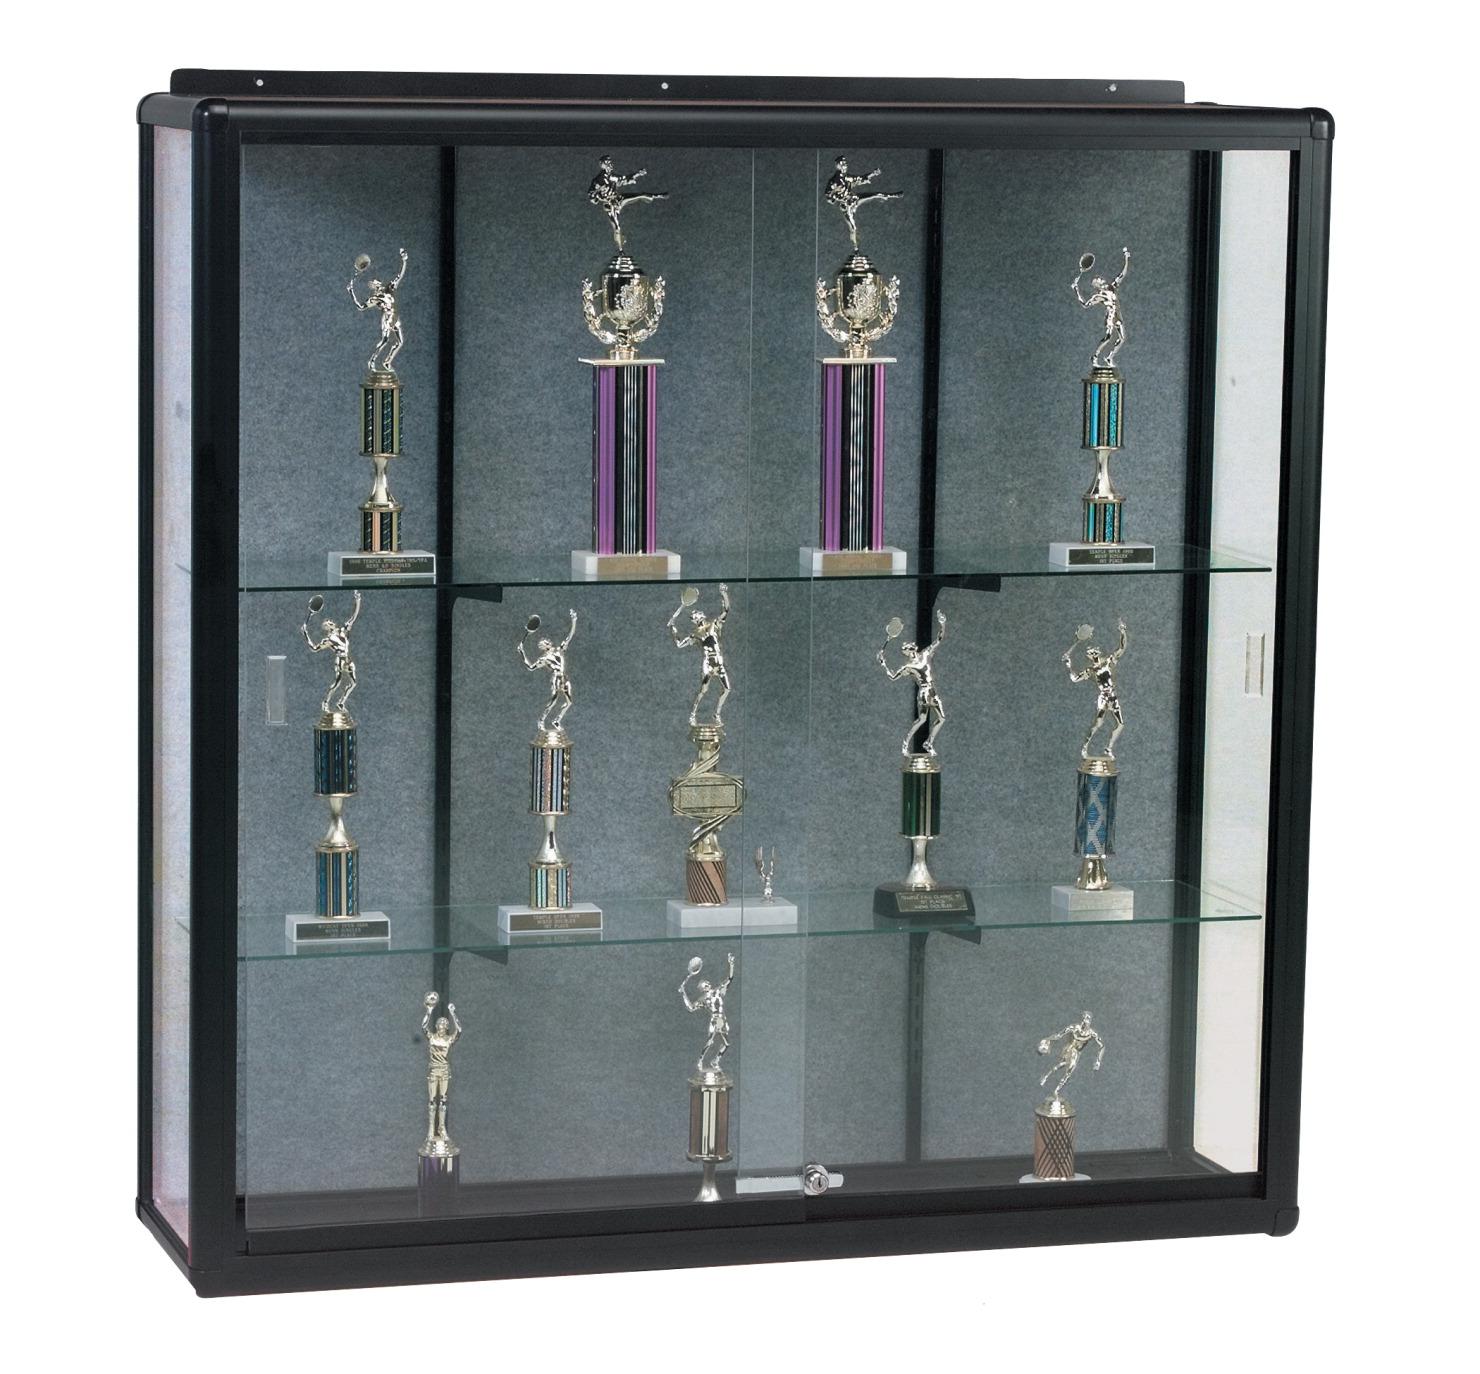 trophy case school specialty canada. Black Bedroom Furniture Sets. Home Design Ideas